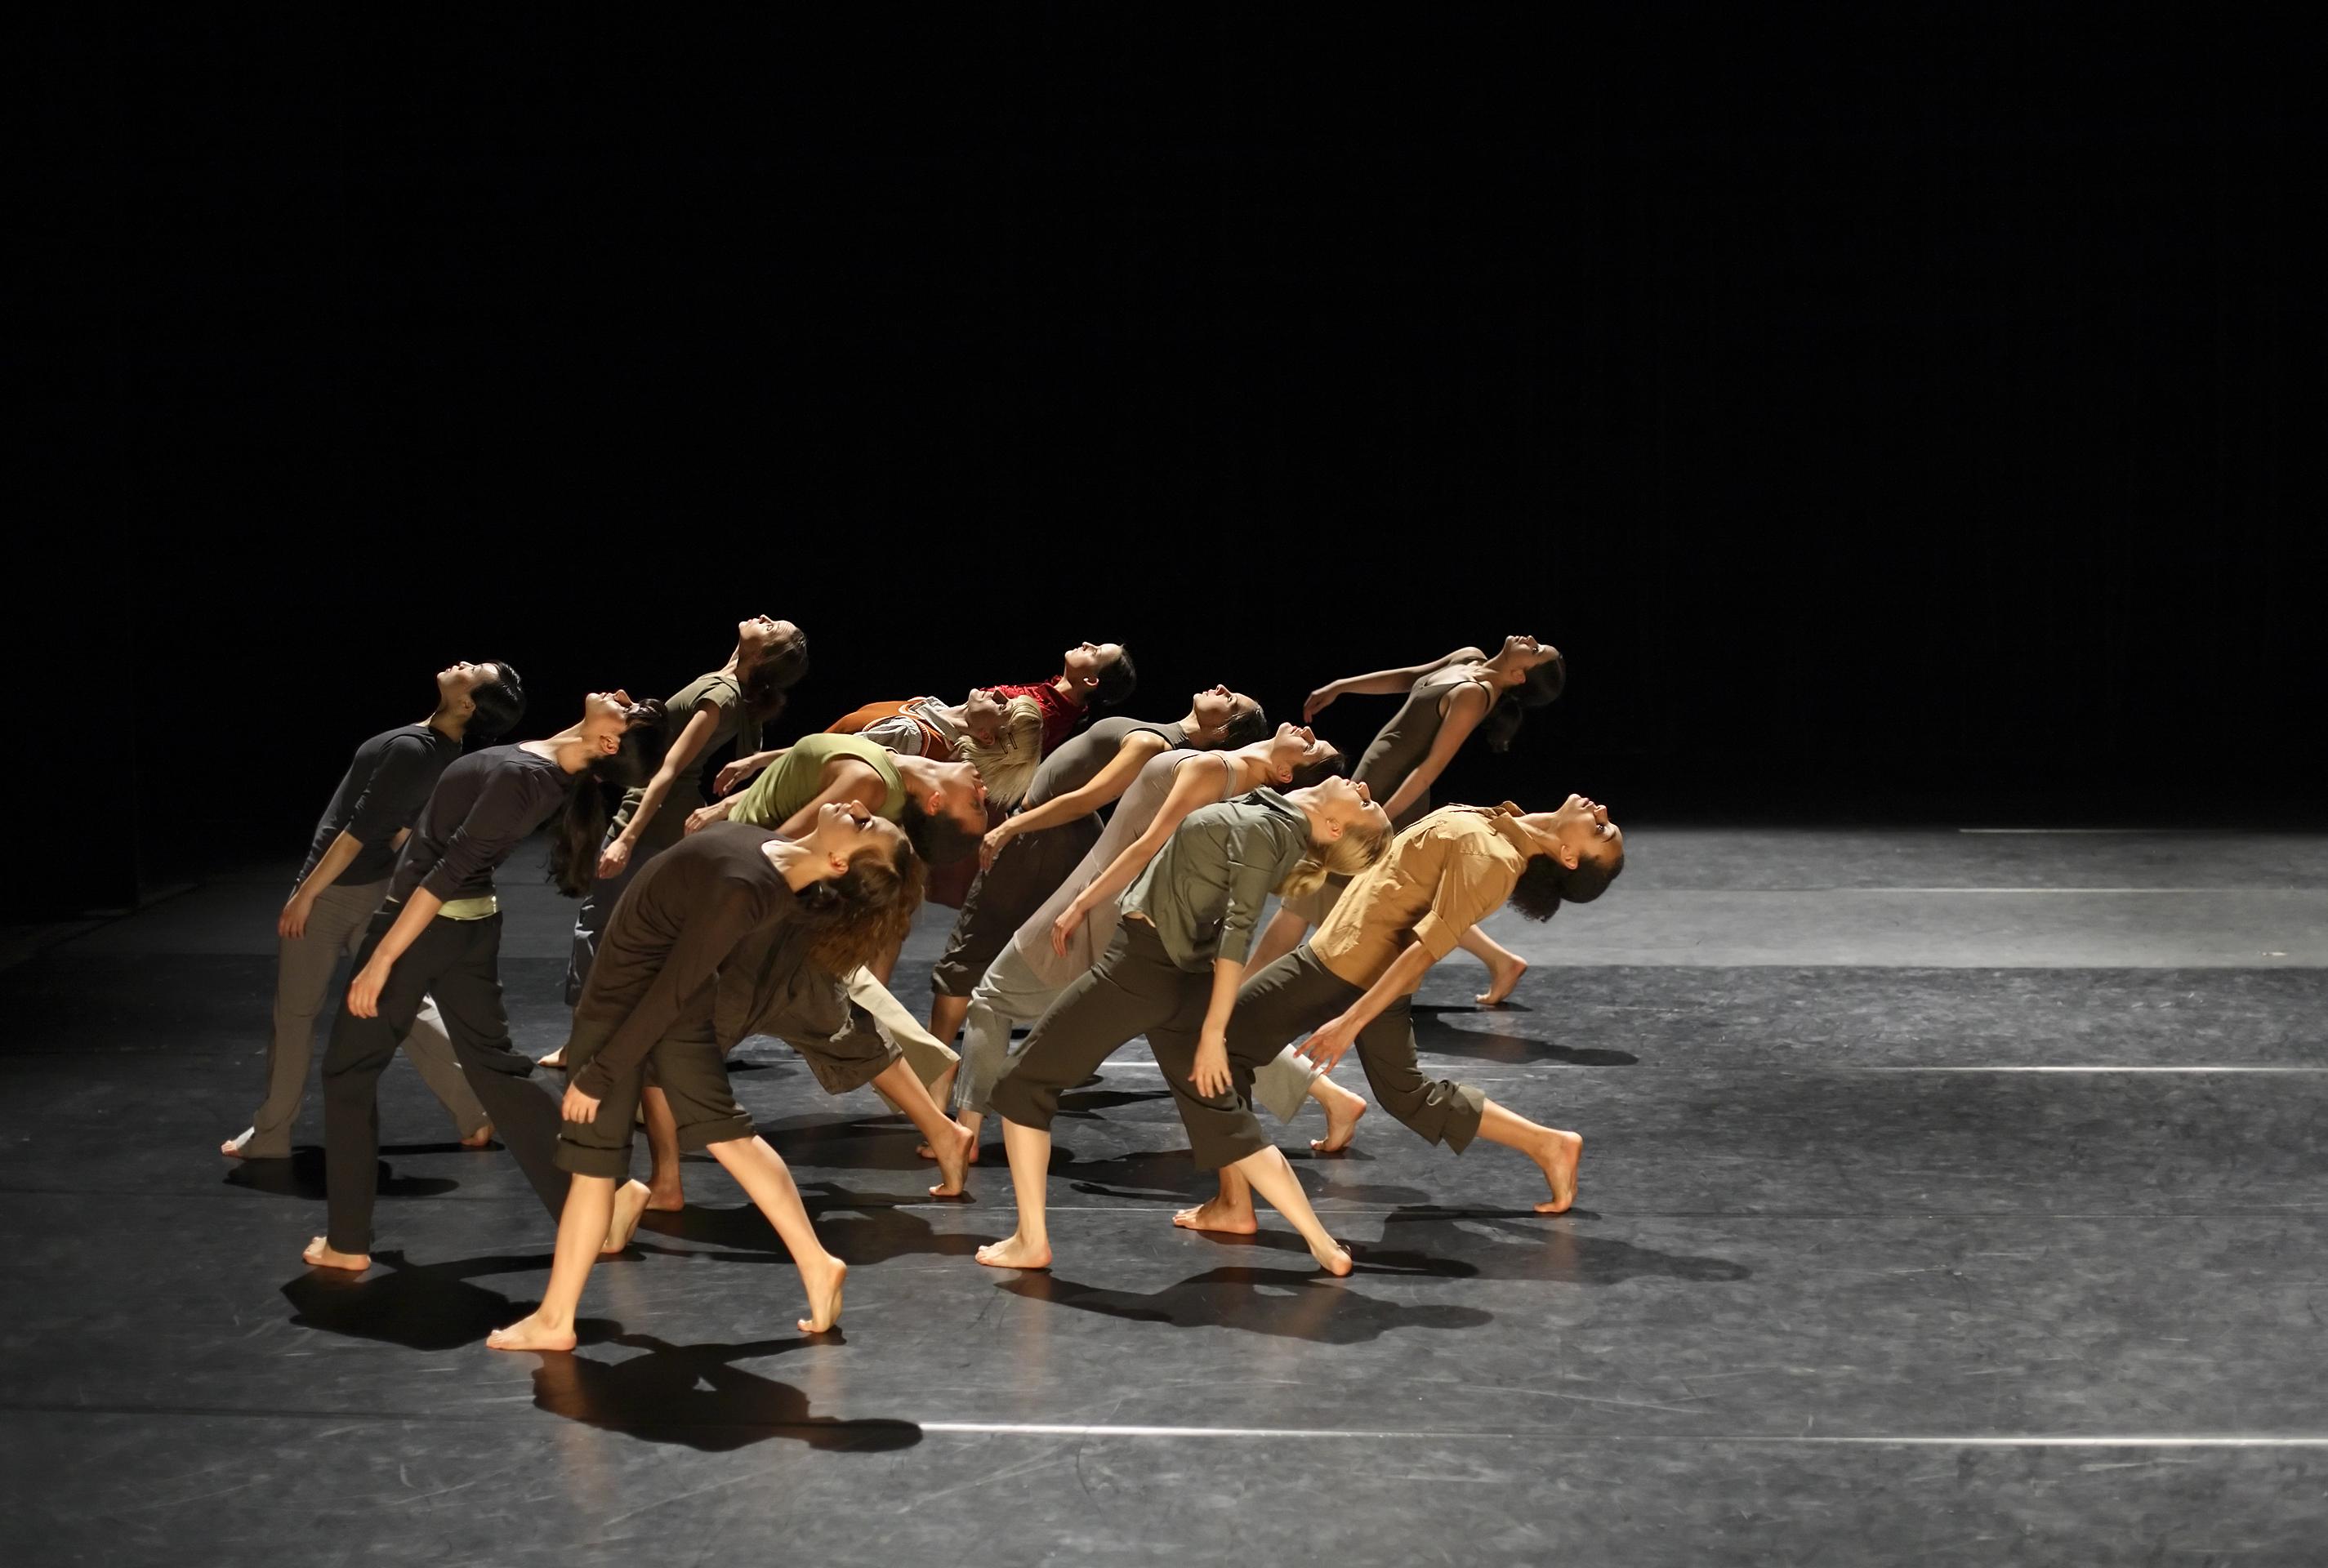 danse contemporaine